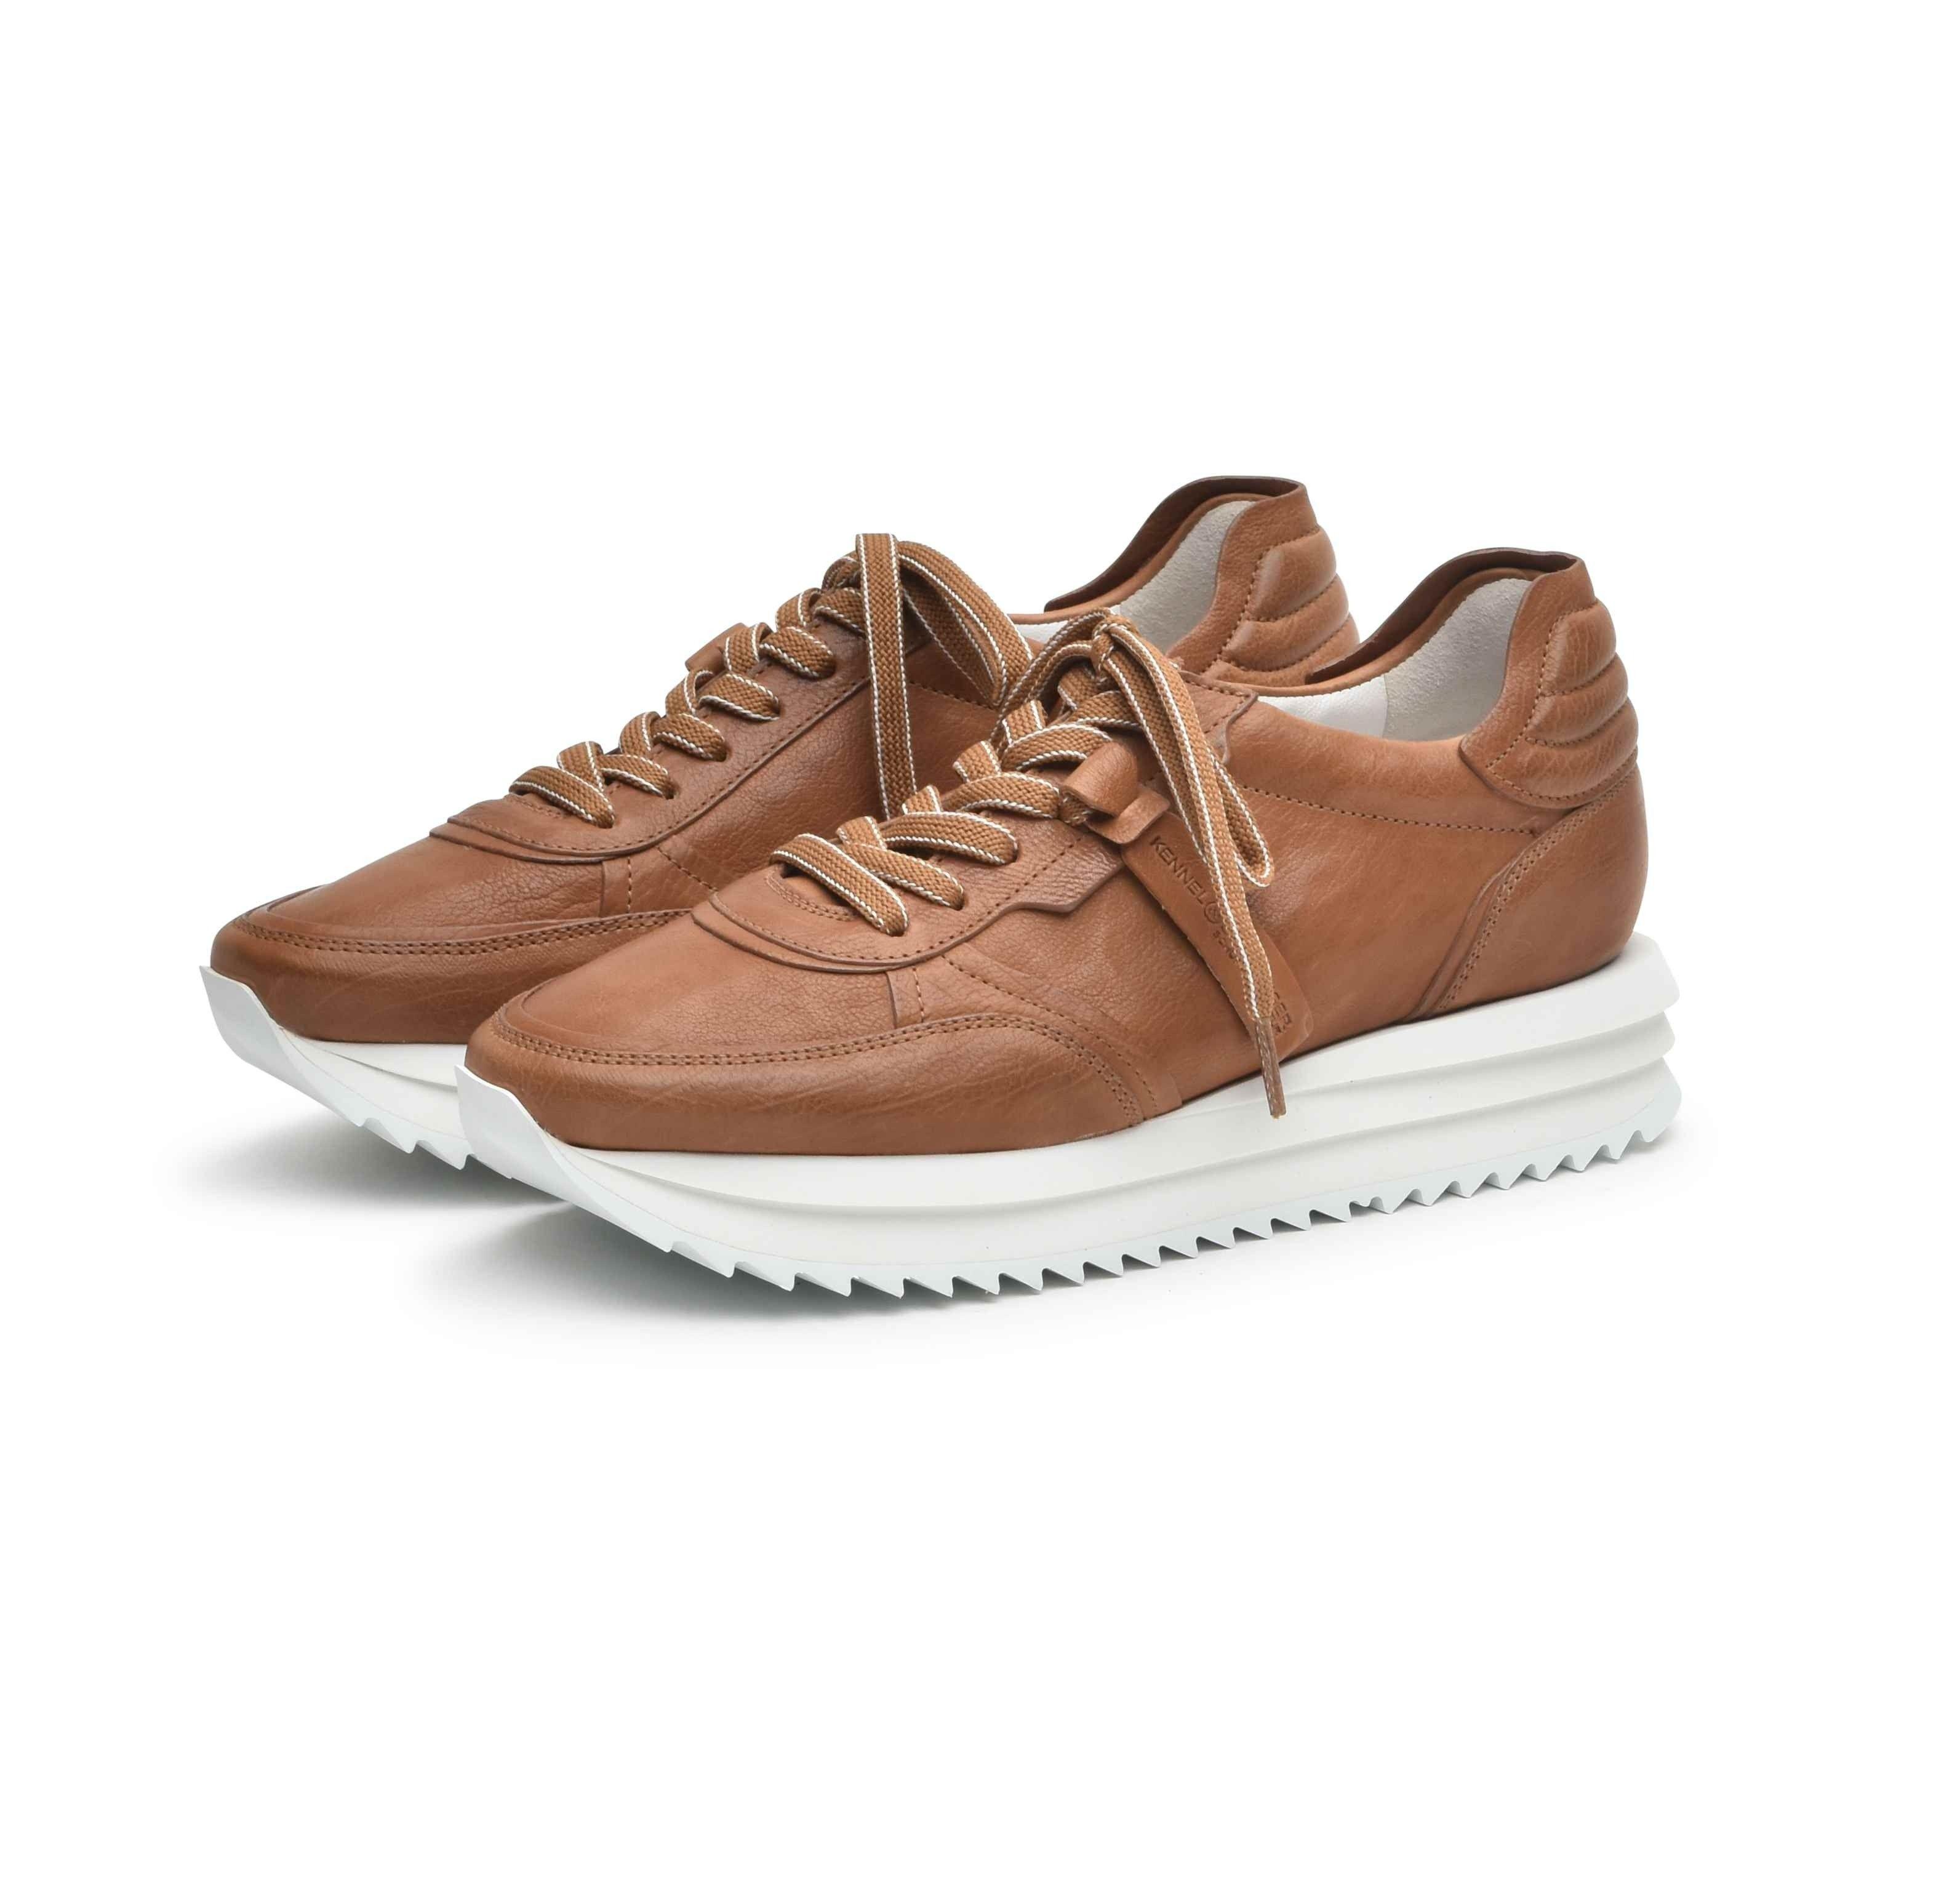 KENNEL&SCHMENGER - Damen Sneaker - Jazz - Bianco/Caramel